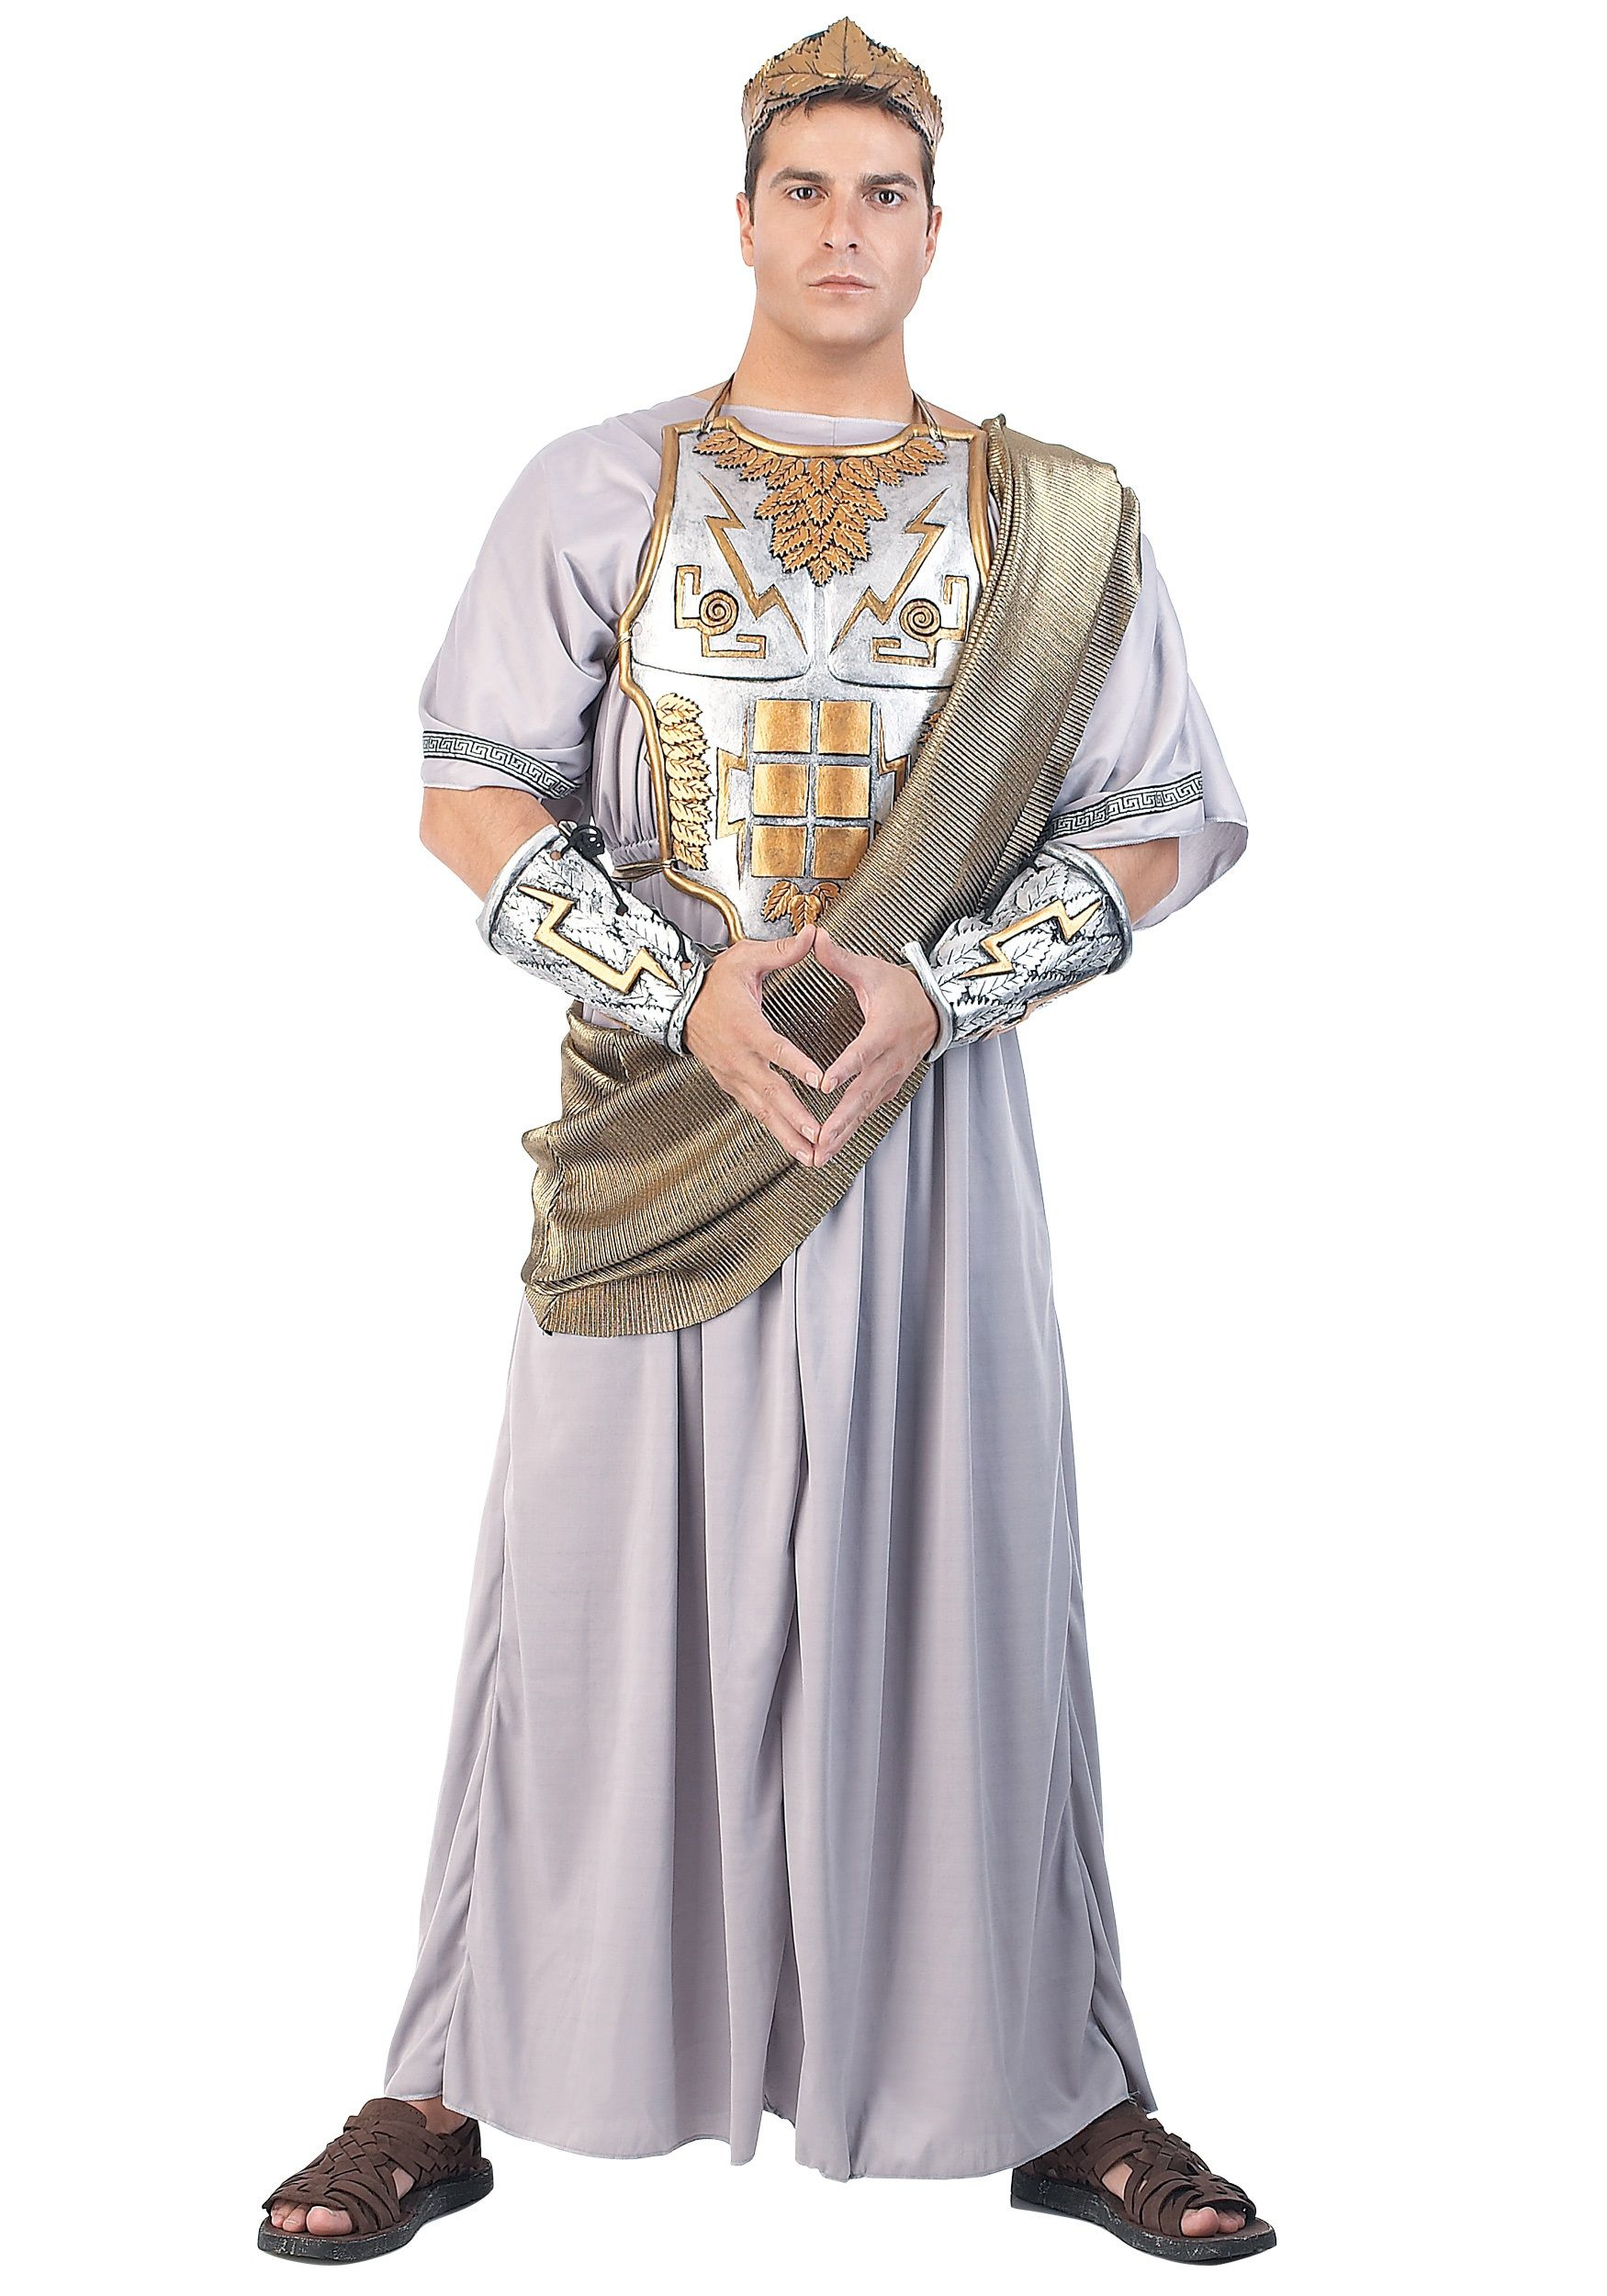 Poseidon costumes diy - Google Search | Costumes ...